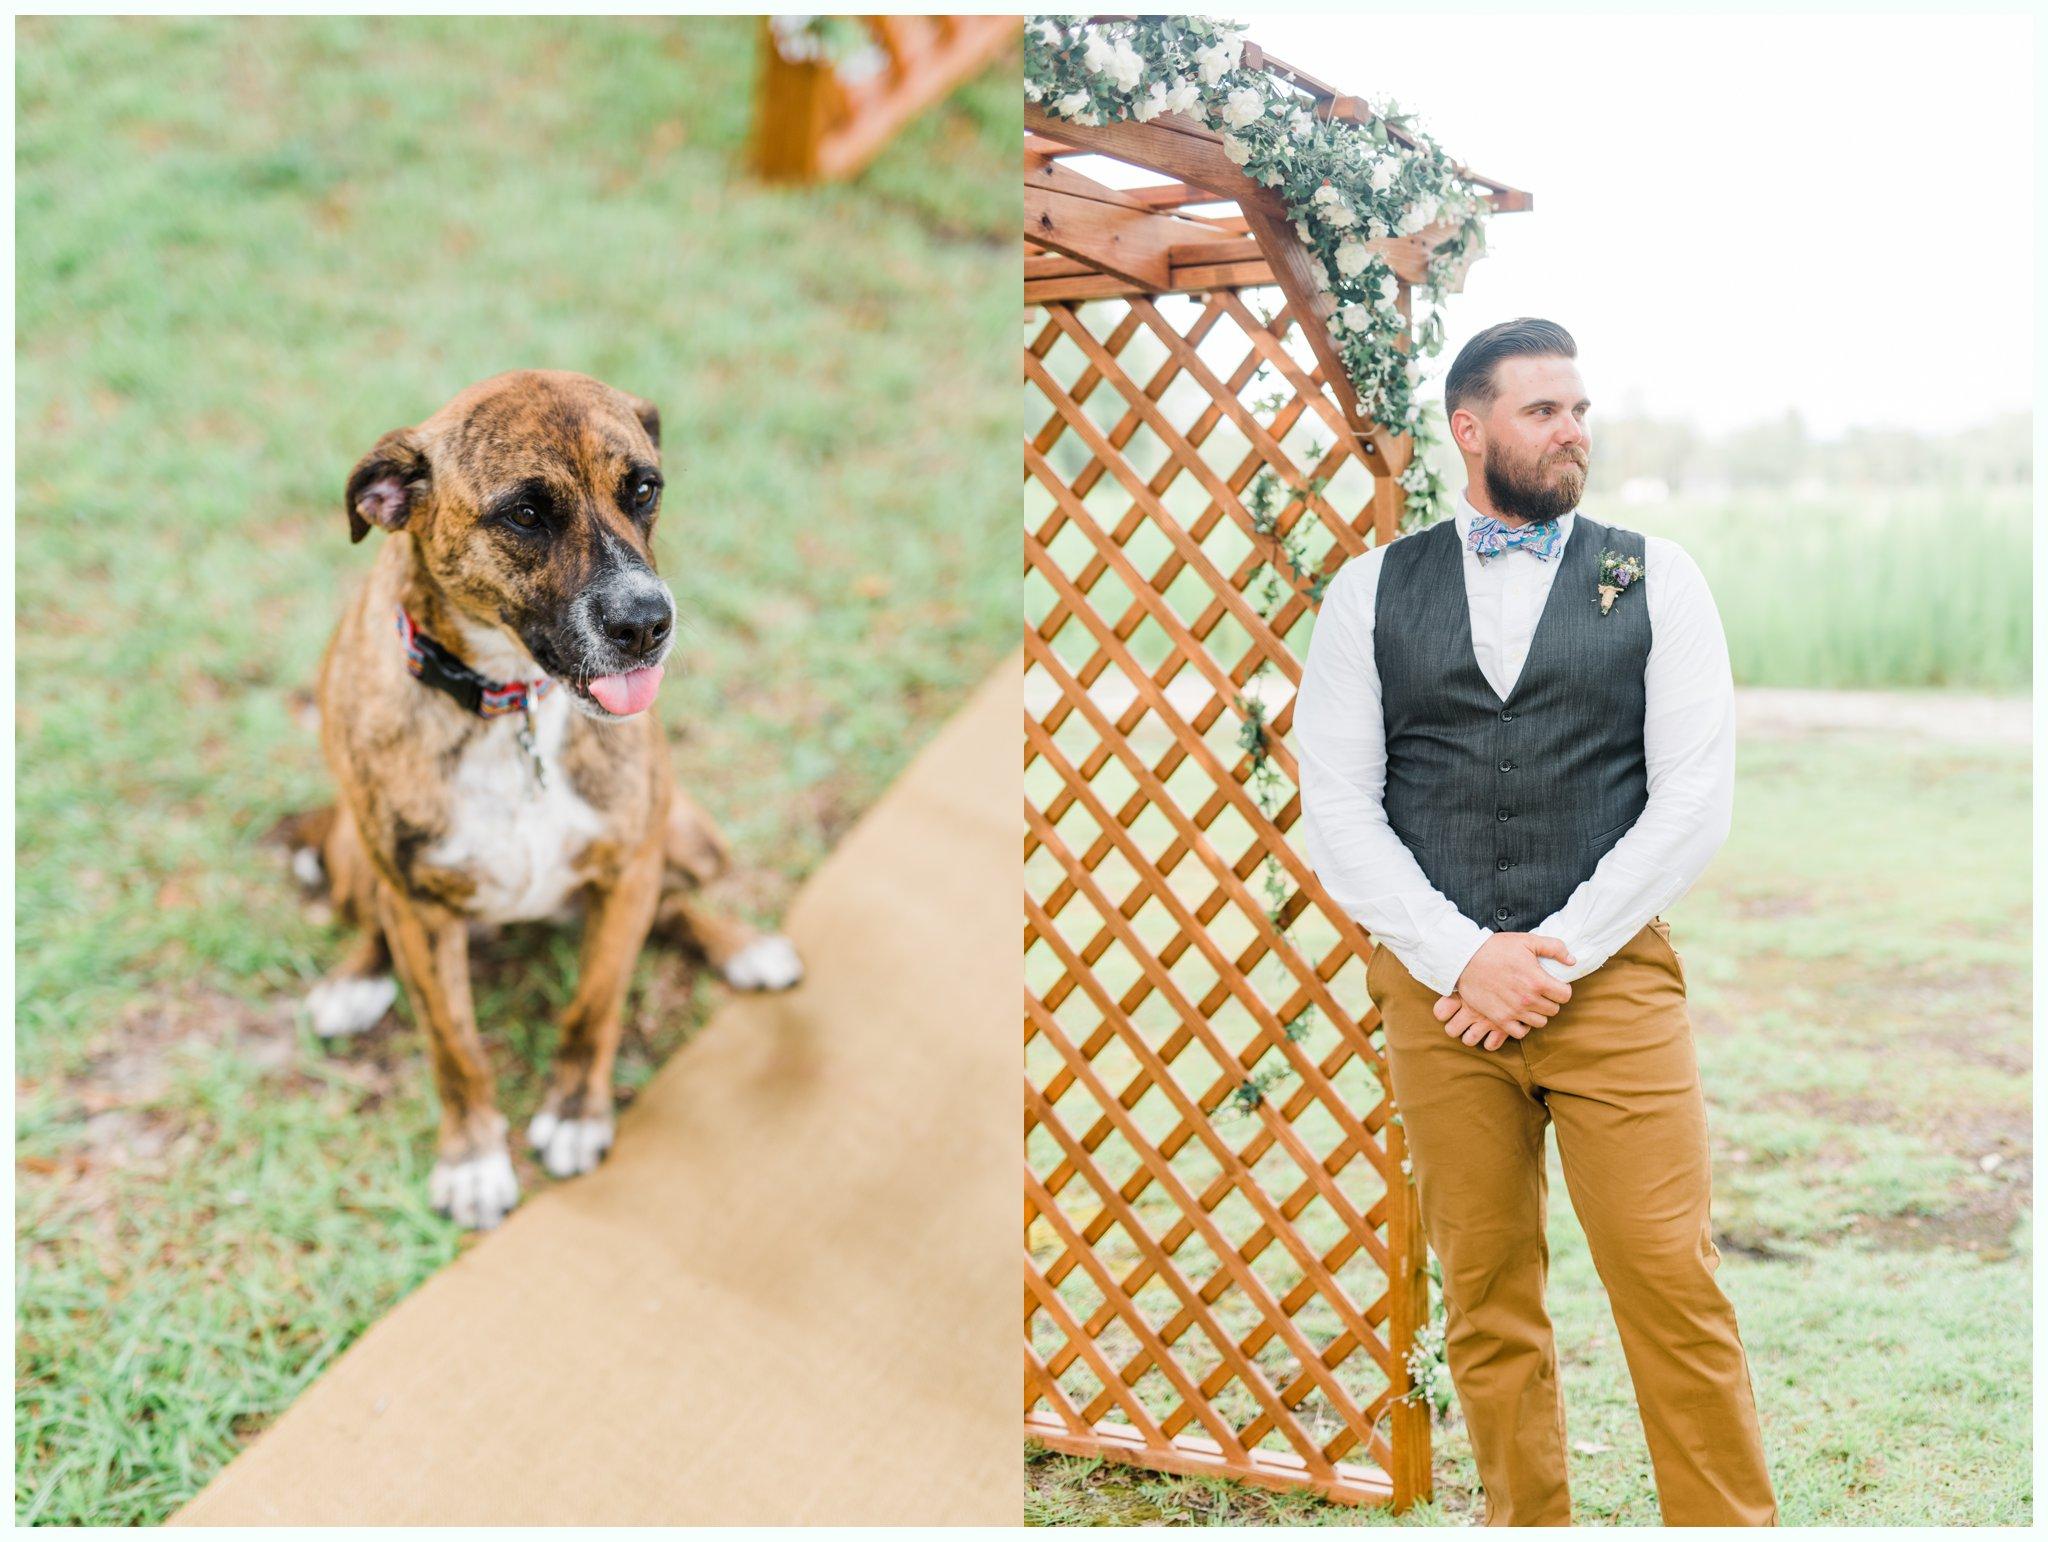 Jake&rhondawedding_5206.jpg